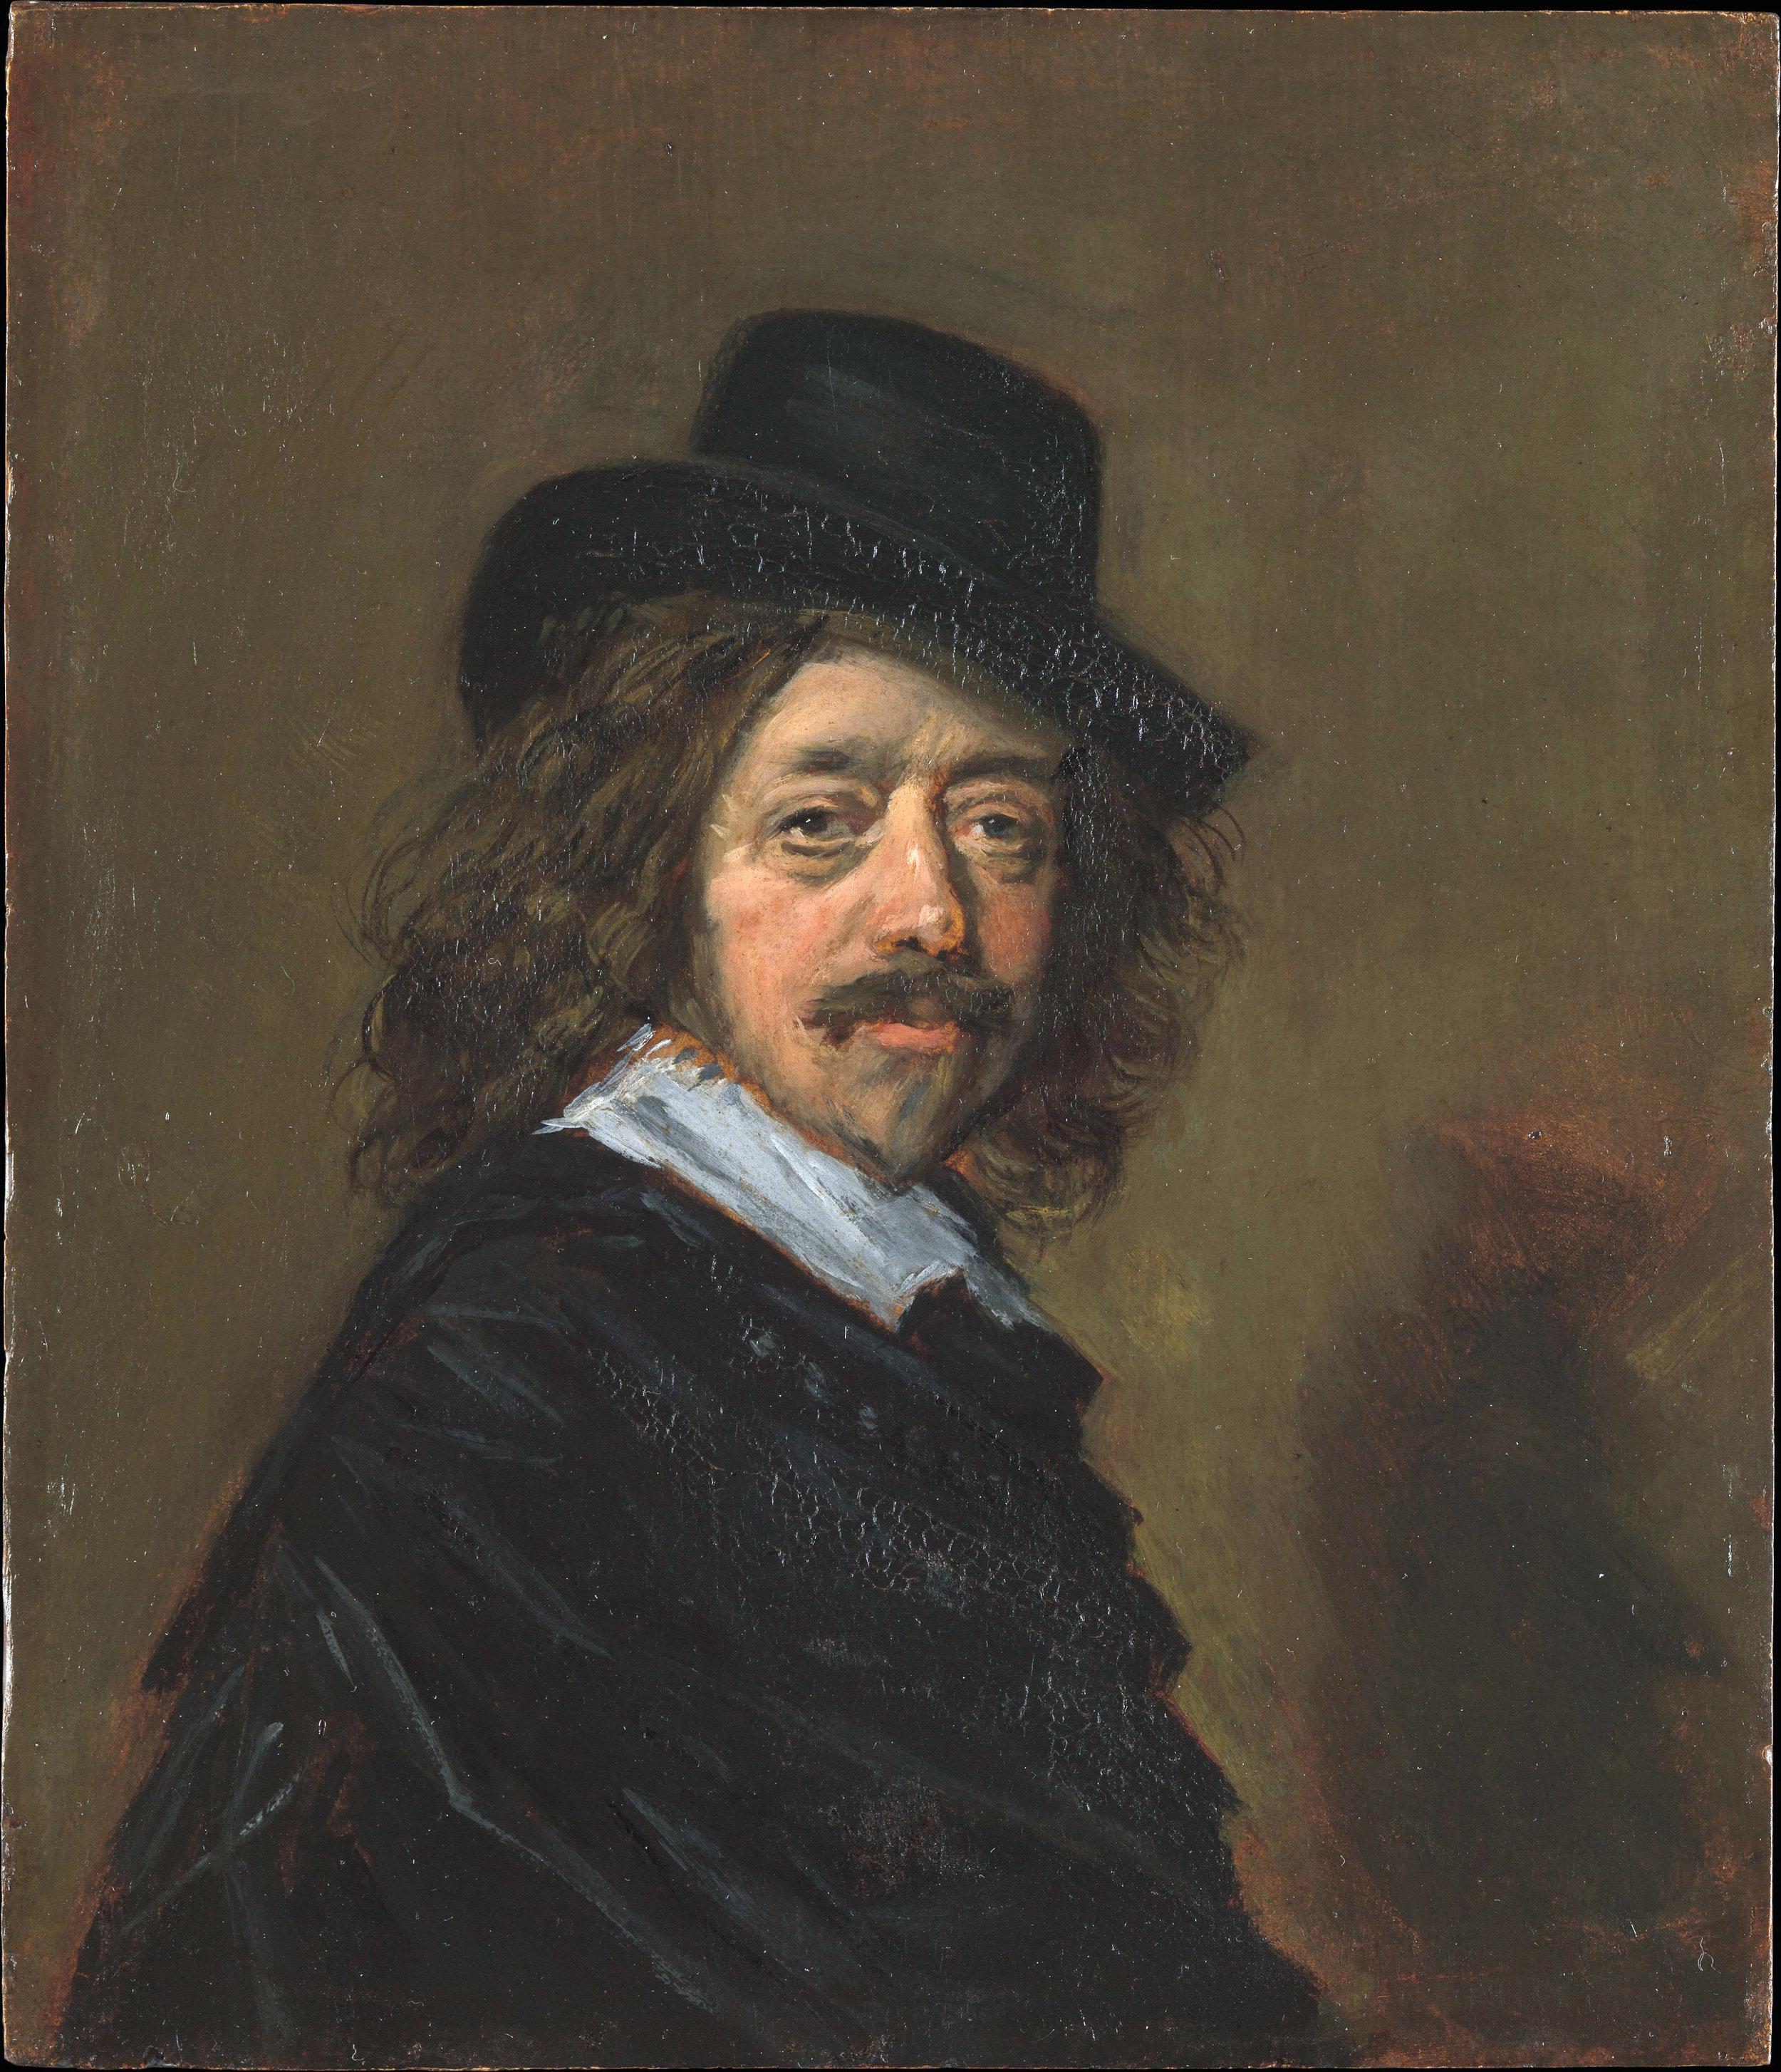 Follower of Frans Hals, Copy of a Self-Portrait by Frans Hals, c. 1650s